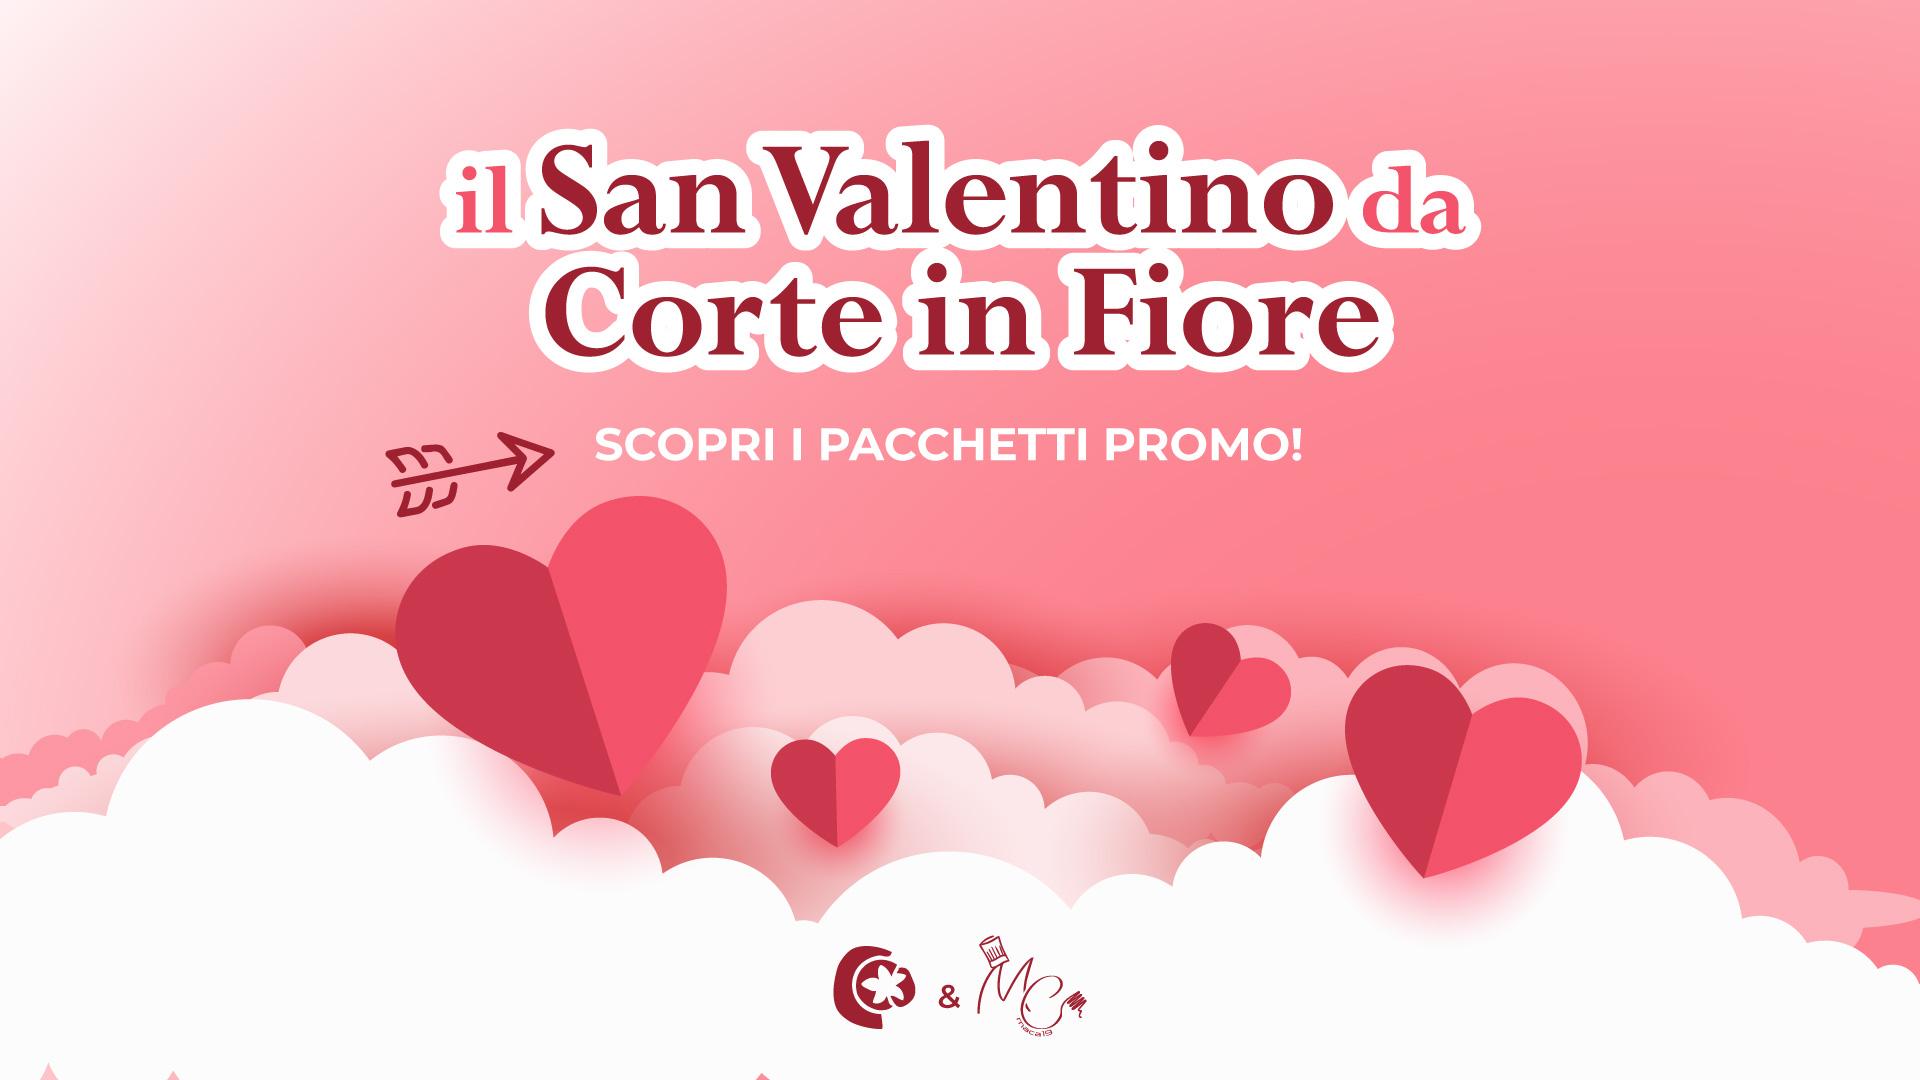 San-Valentino-pacchetti-corteinfiore